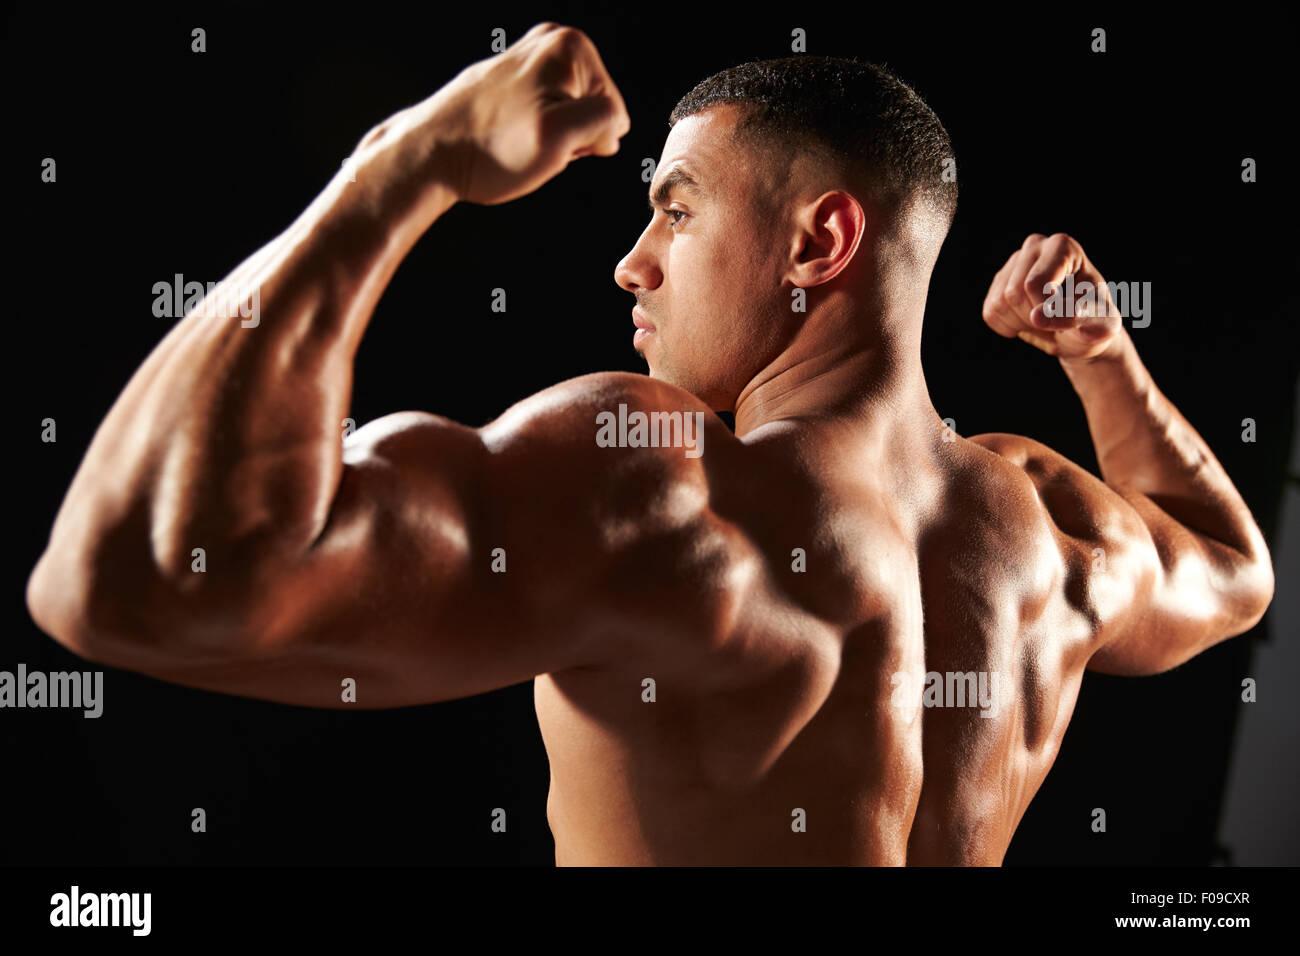 flexing muscles stock photos